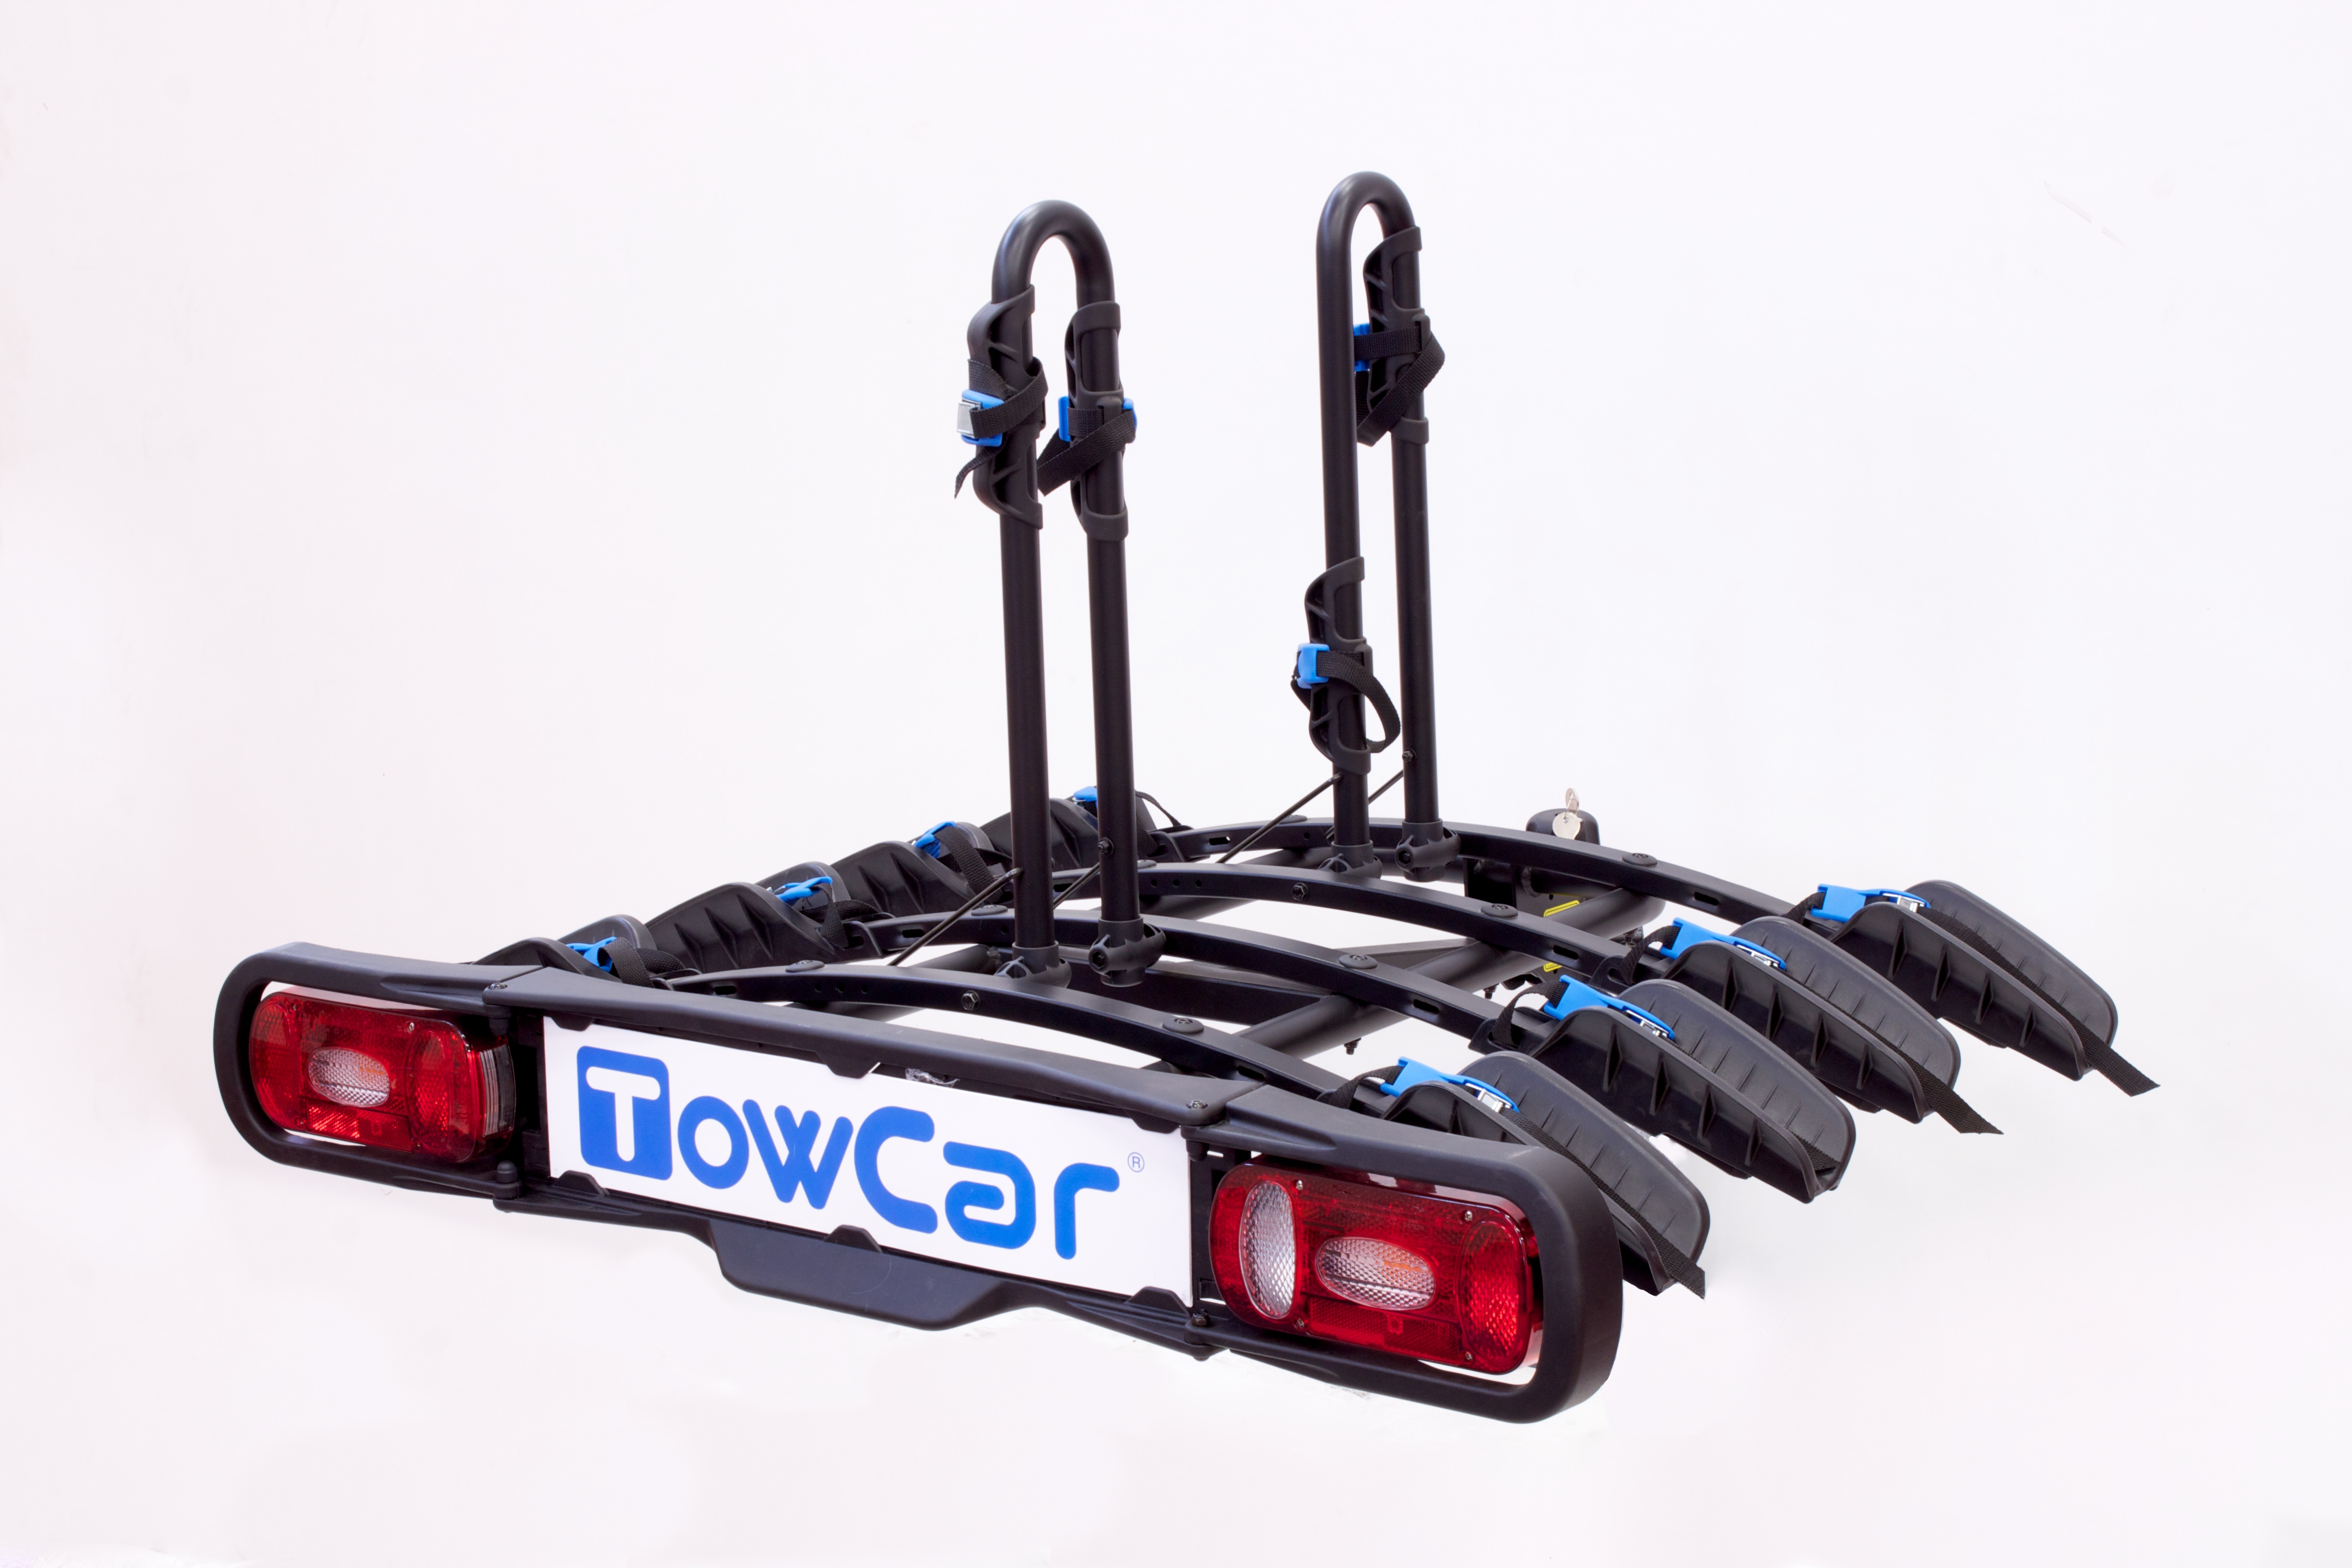 Portabici Towcar4